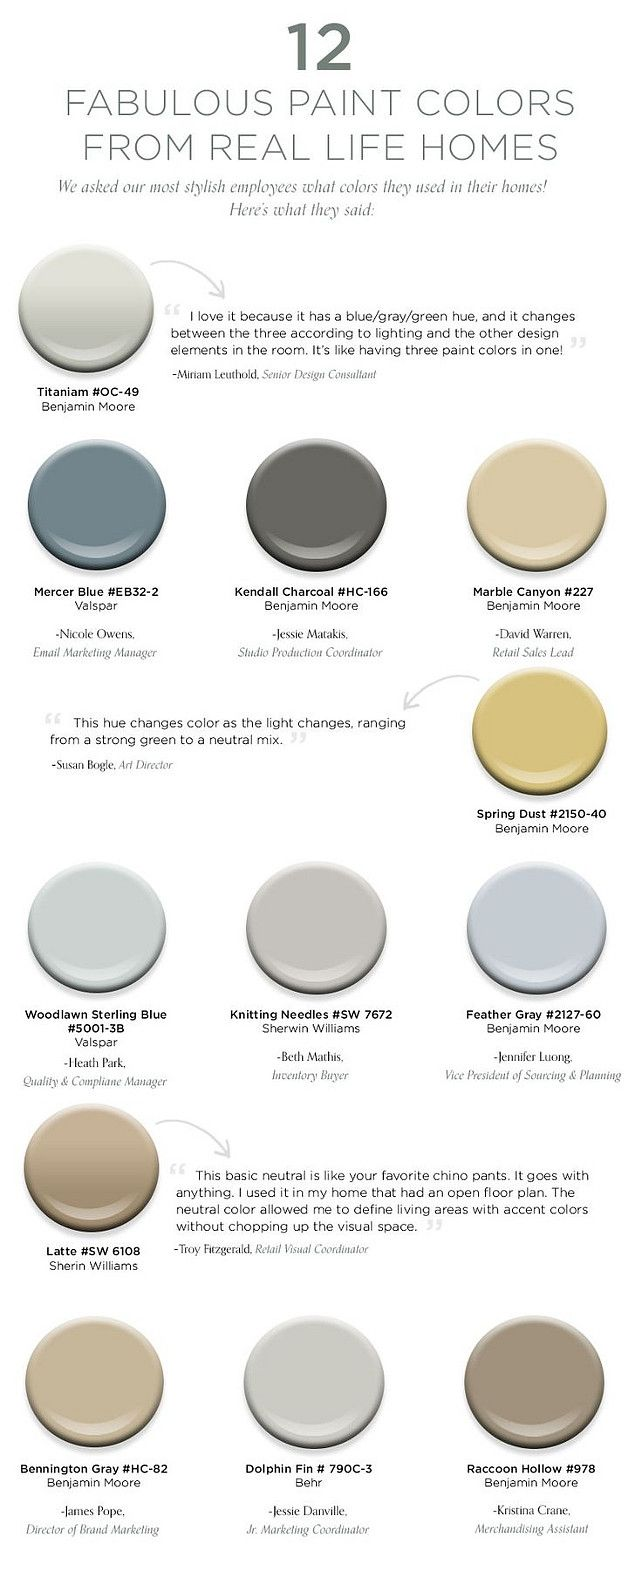 709 best color palettes images on pinterest | colors, wall colors